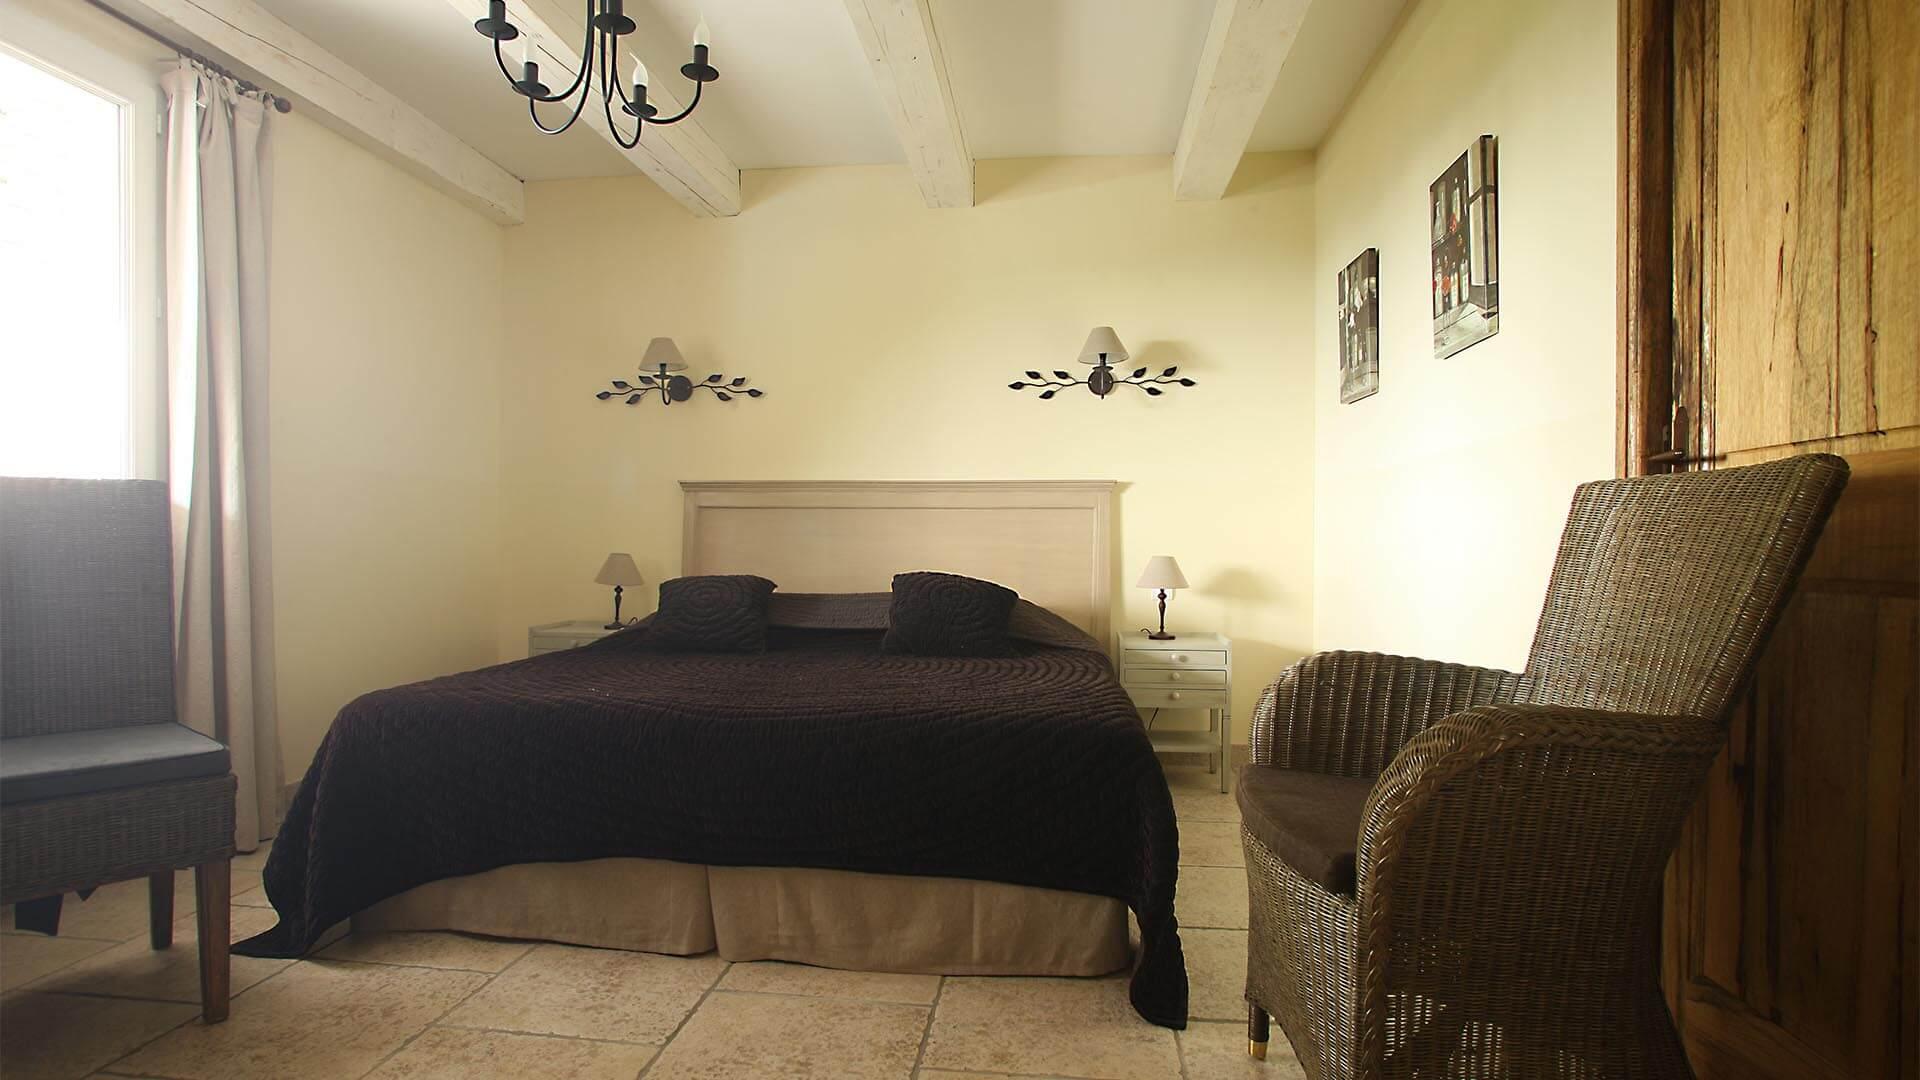 Location villa de vacances Forcalquier | Villa les oliviers | Chambre double